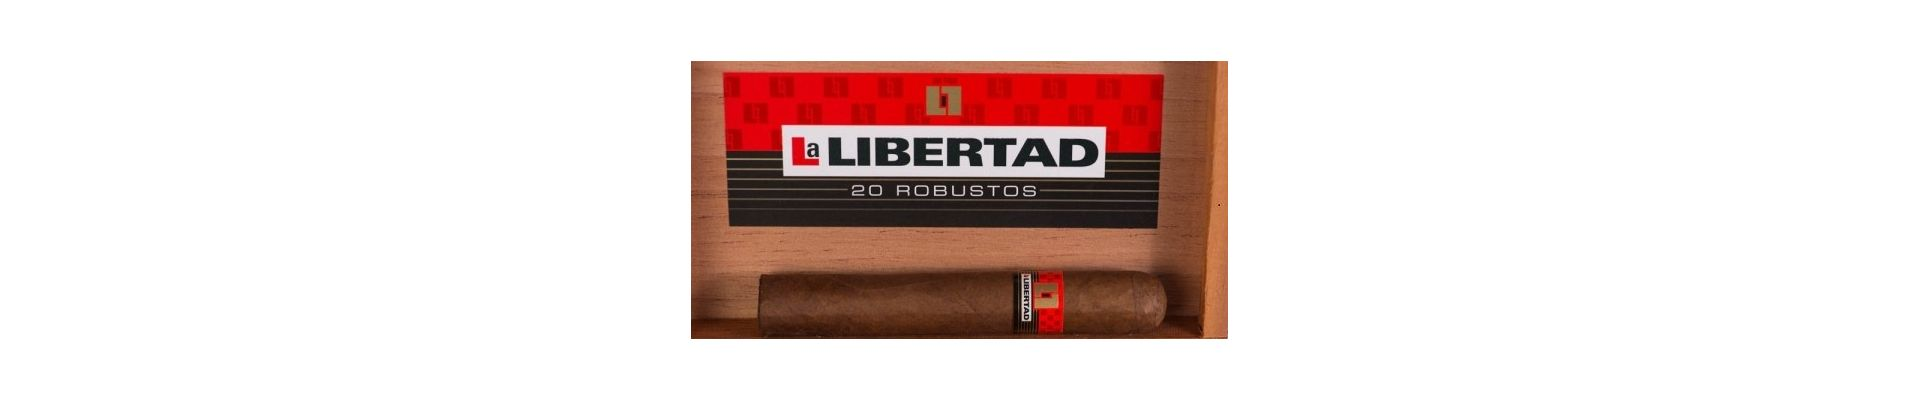 Magazin trabucuri La Libertad de vanzare.Pret trabucuri La Libertad